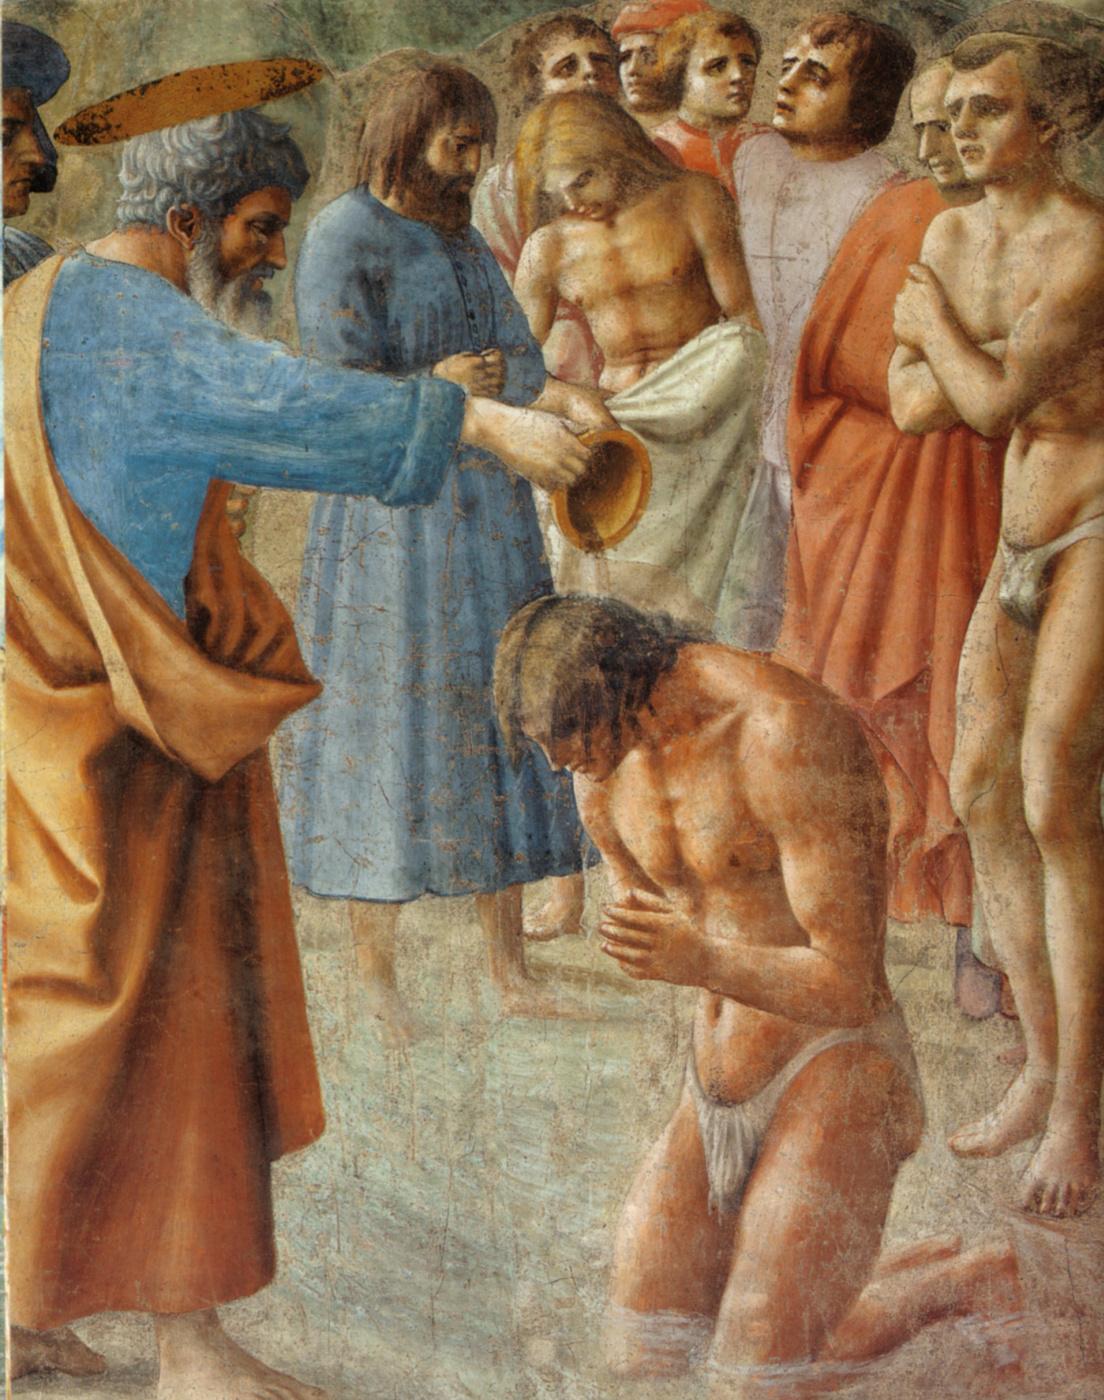 Tommaso Masaccio. Brancacci Chapel. Neophyte baptism